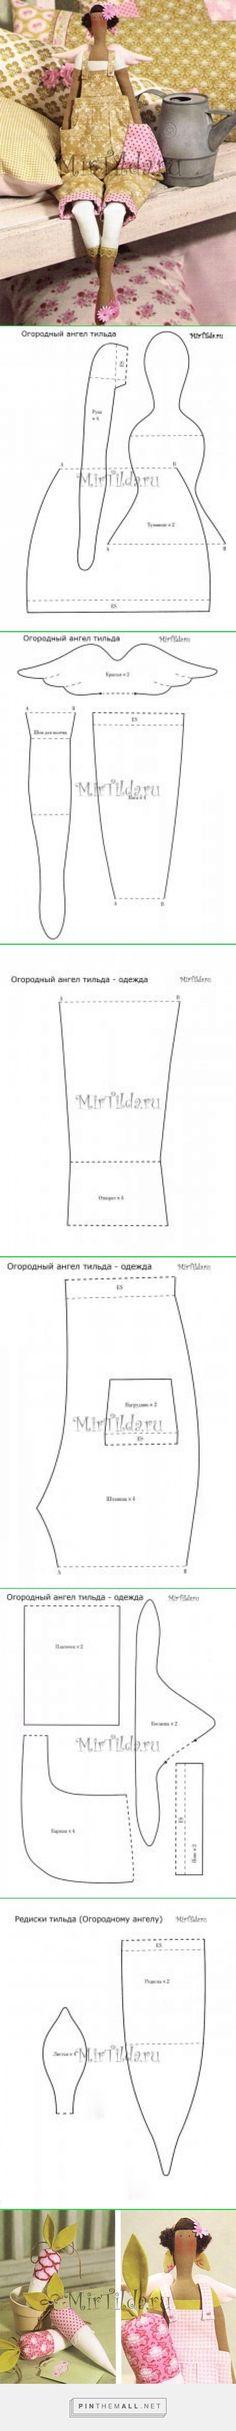 http://pinthemall.net/pin/55eb30aa784fd/?creation=1